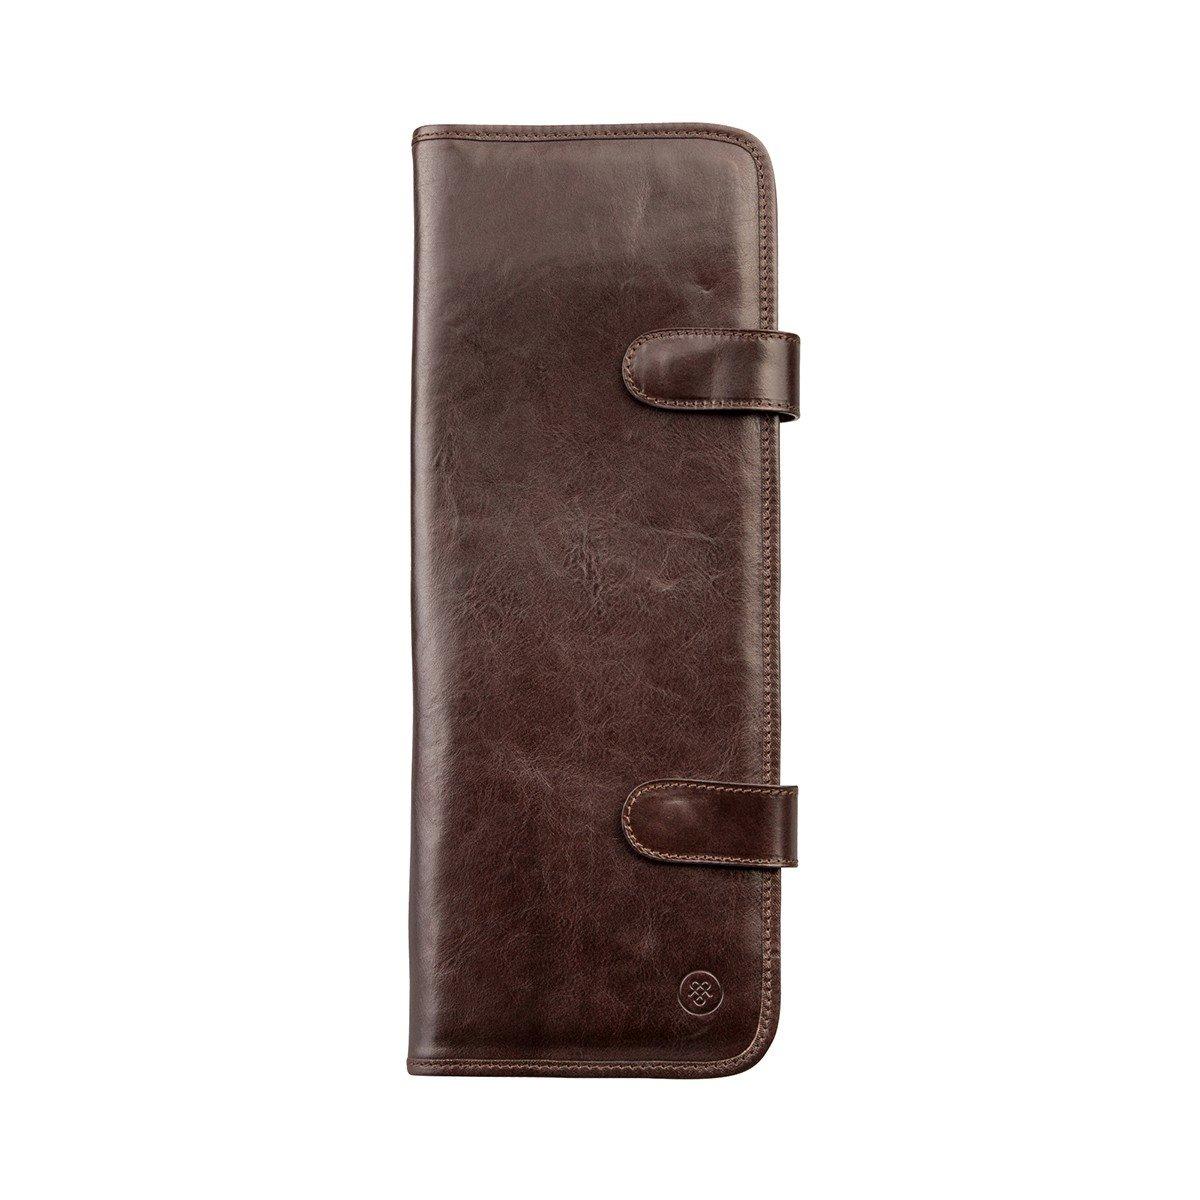 Maxwell Scott Luxury Italian Leather Tie Carrier, Dark Chocolate Brown (Tivoli)